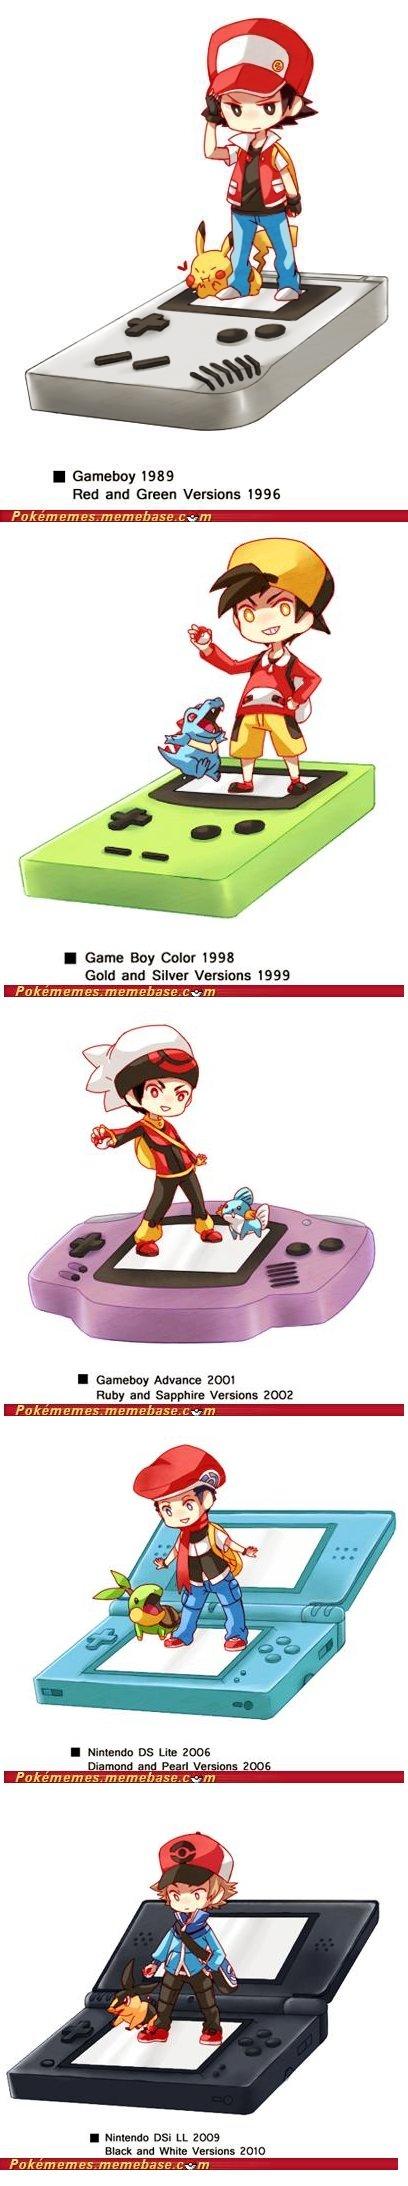 Pokemon Game Evolution